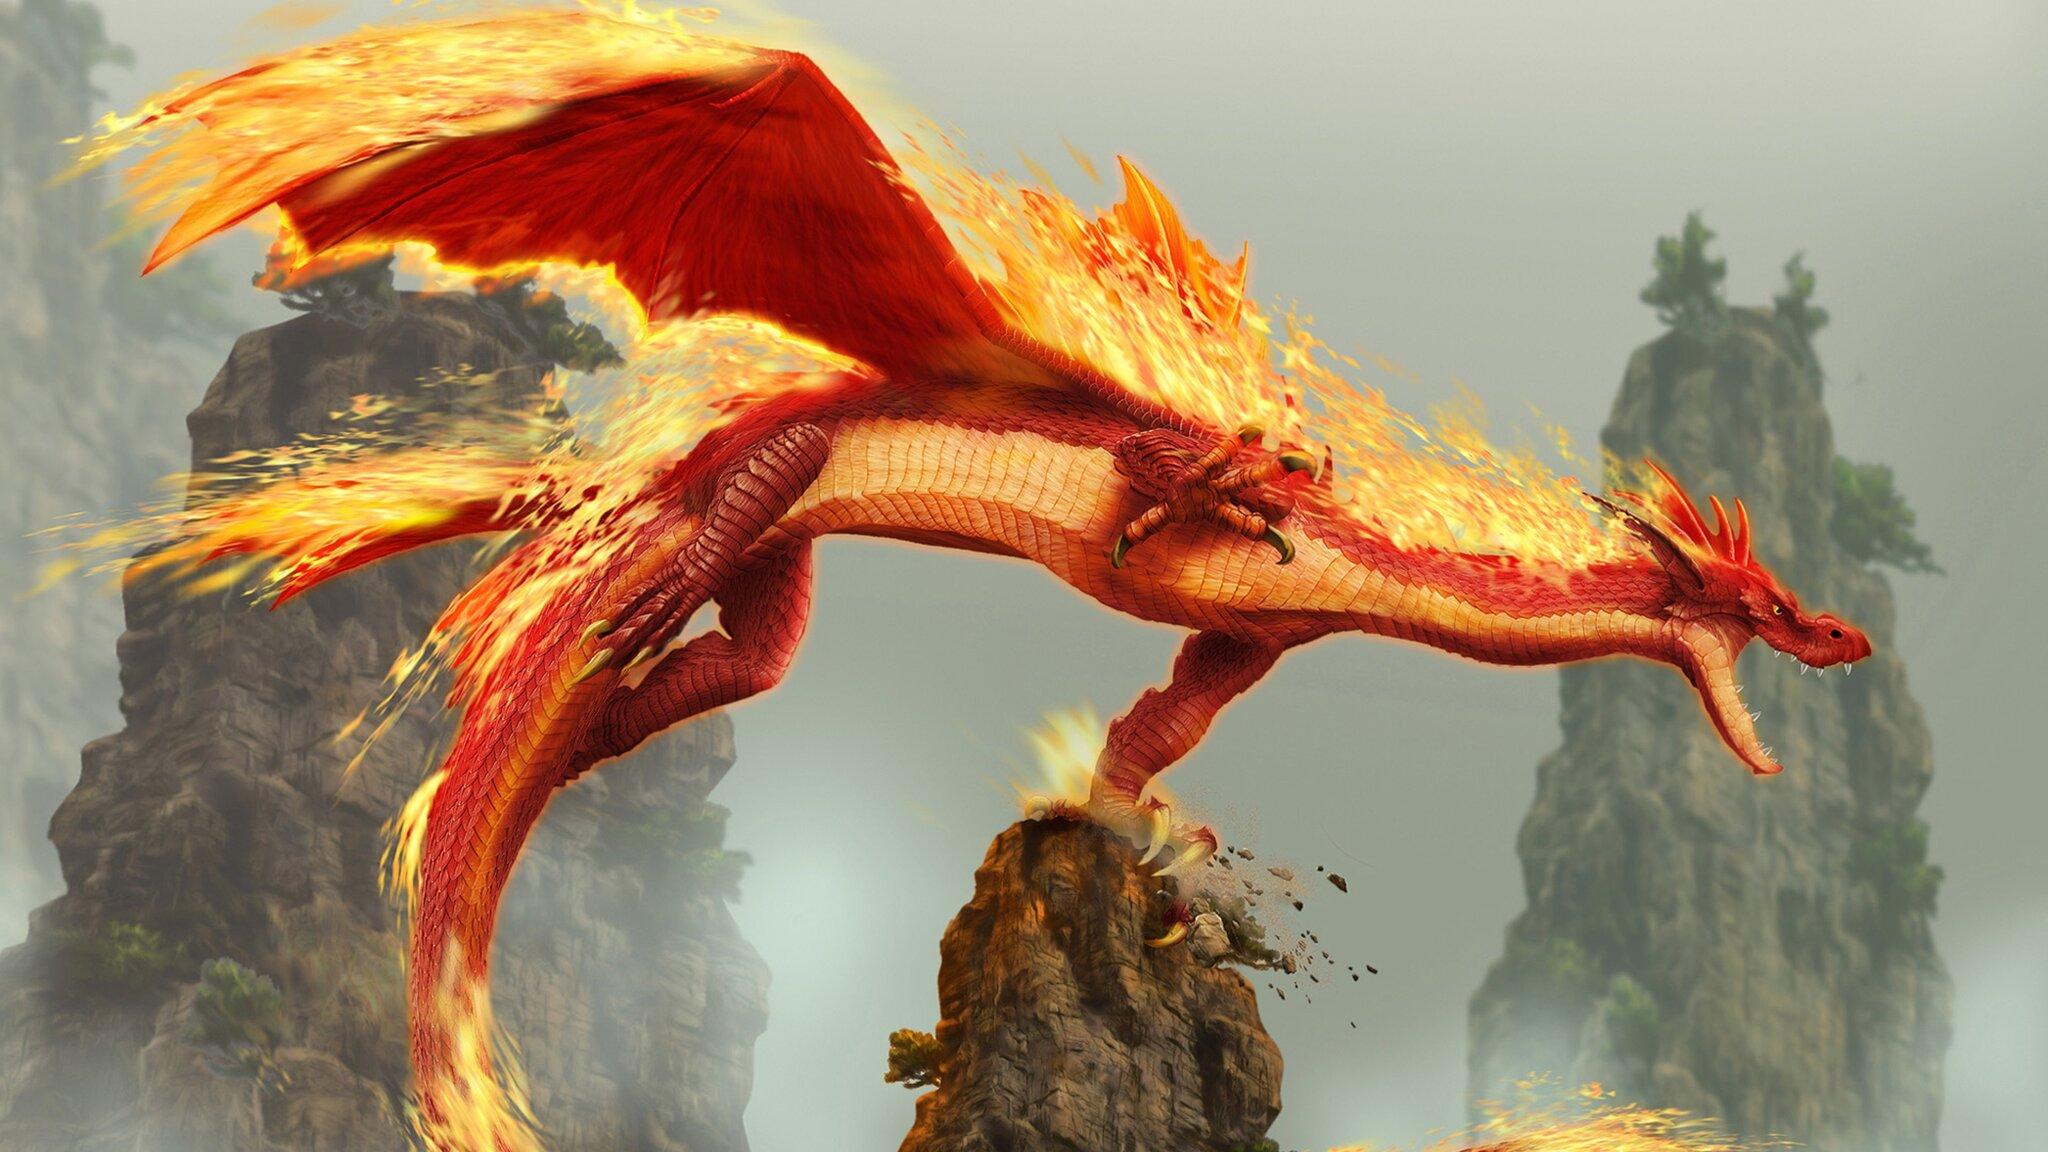 red-fire-dragon-creature-fantasy-monster-5k-we.jpg